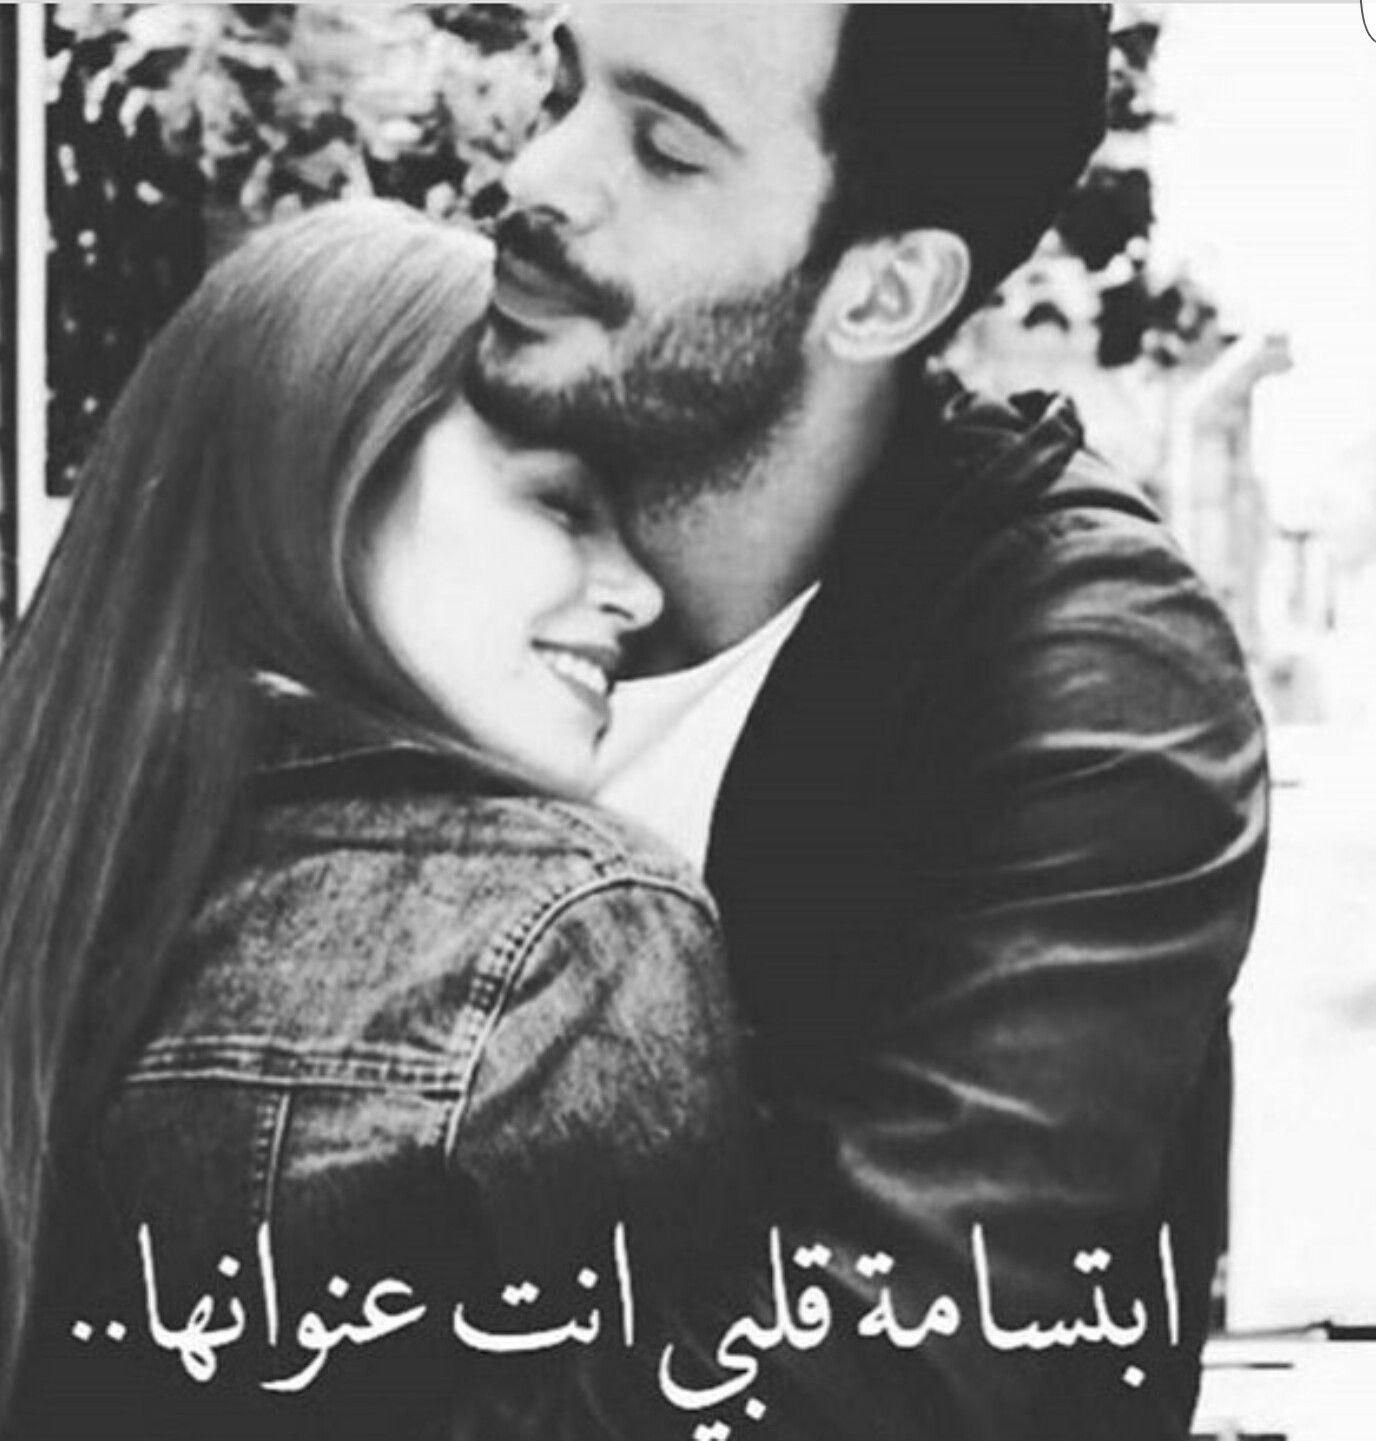 Pin By Zana H Mahmud On Feeling Short Quotes Love Arabic Love Quotes Beautiful Arabic Words